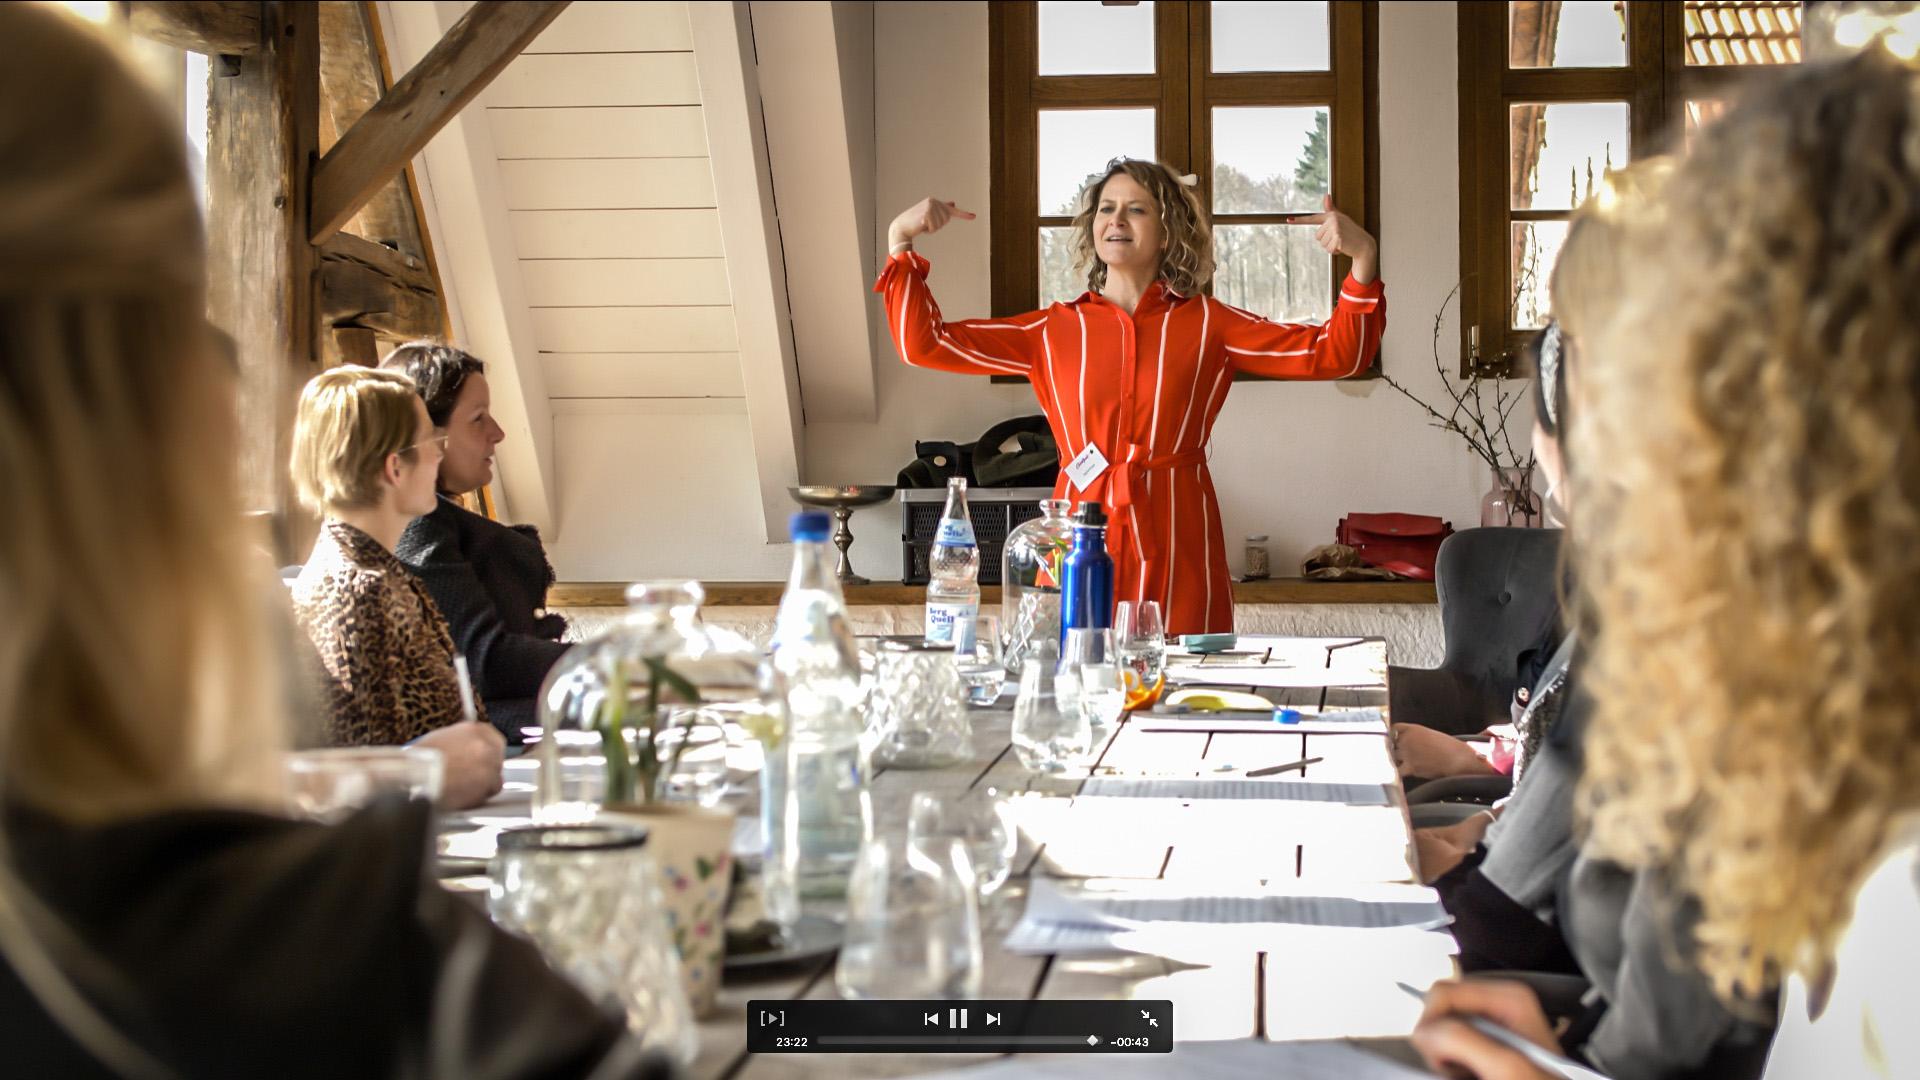 Event planner Heidelberg